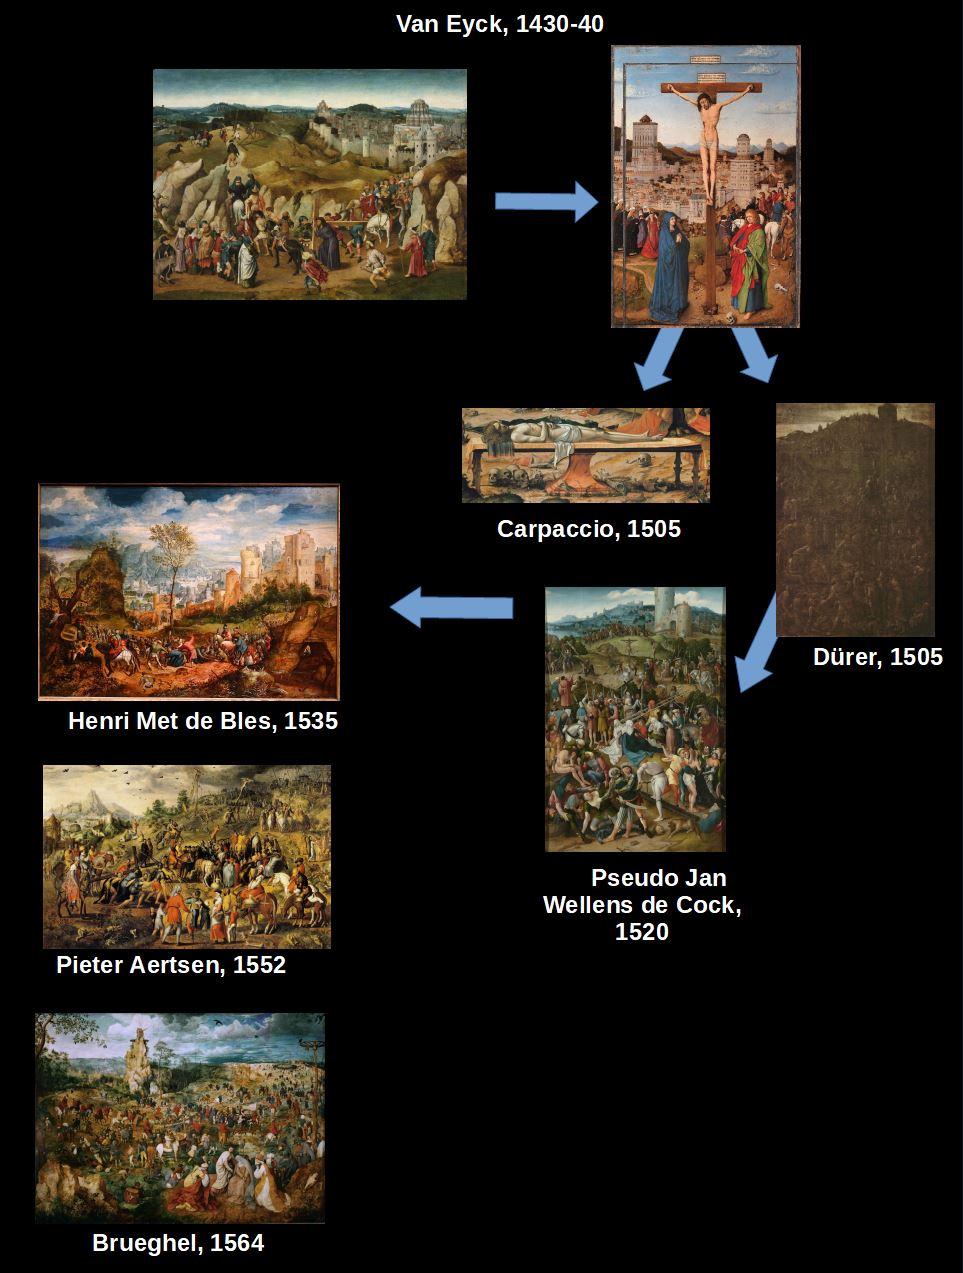 Albrecht Durer, Calvary 1505. Drawing,Florence, Galleria degli Uffizi schema chronoJPG